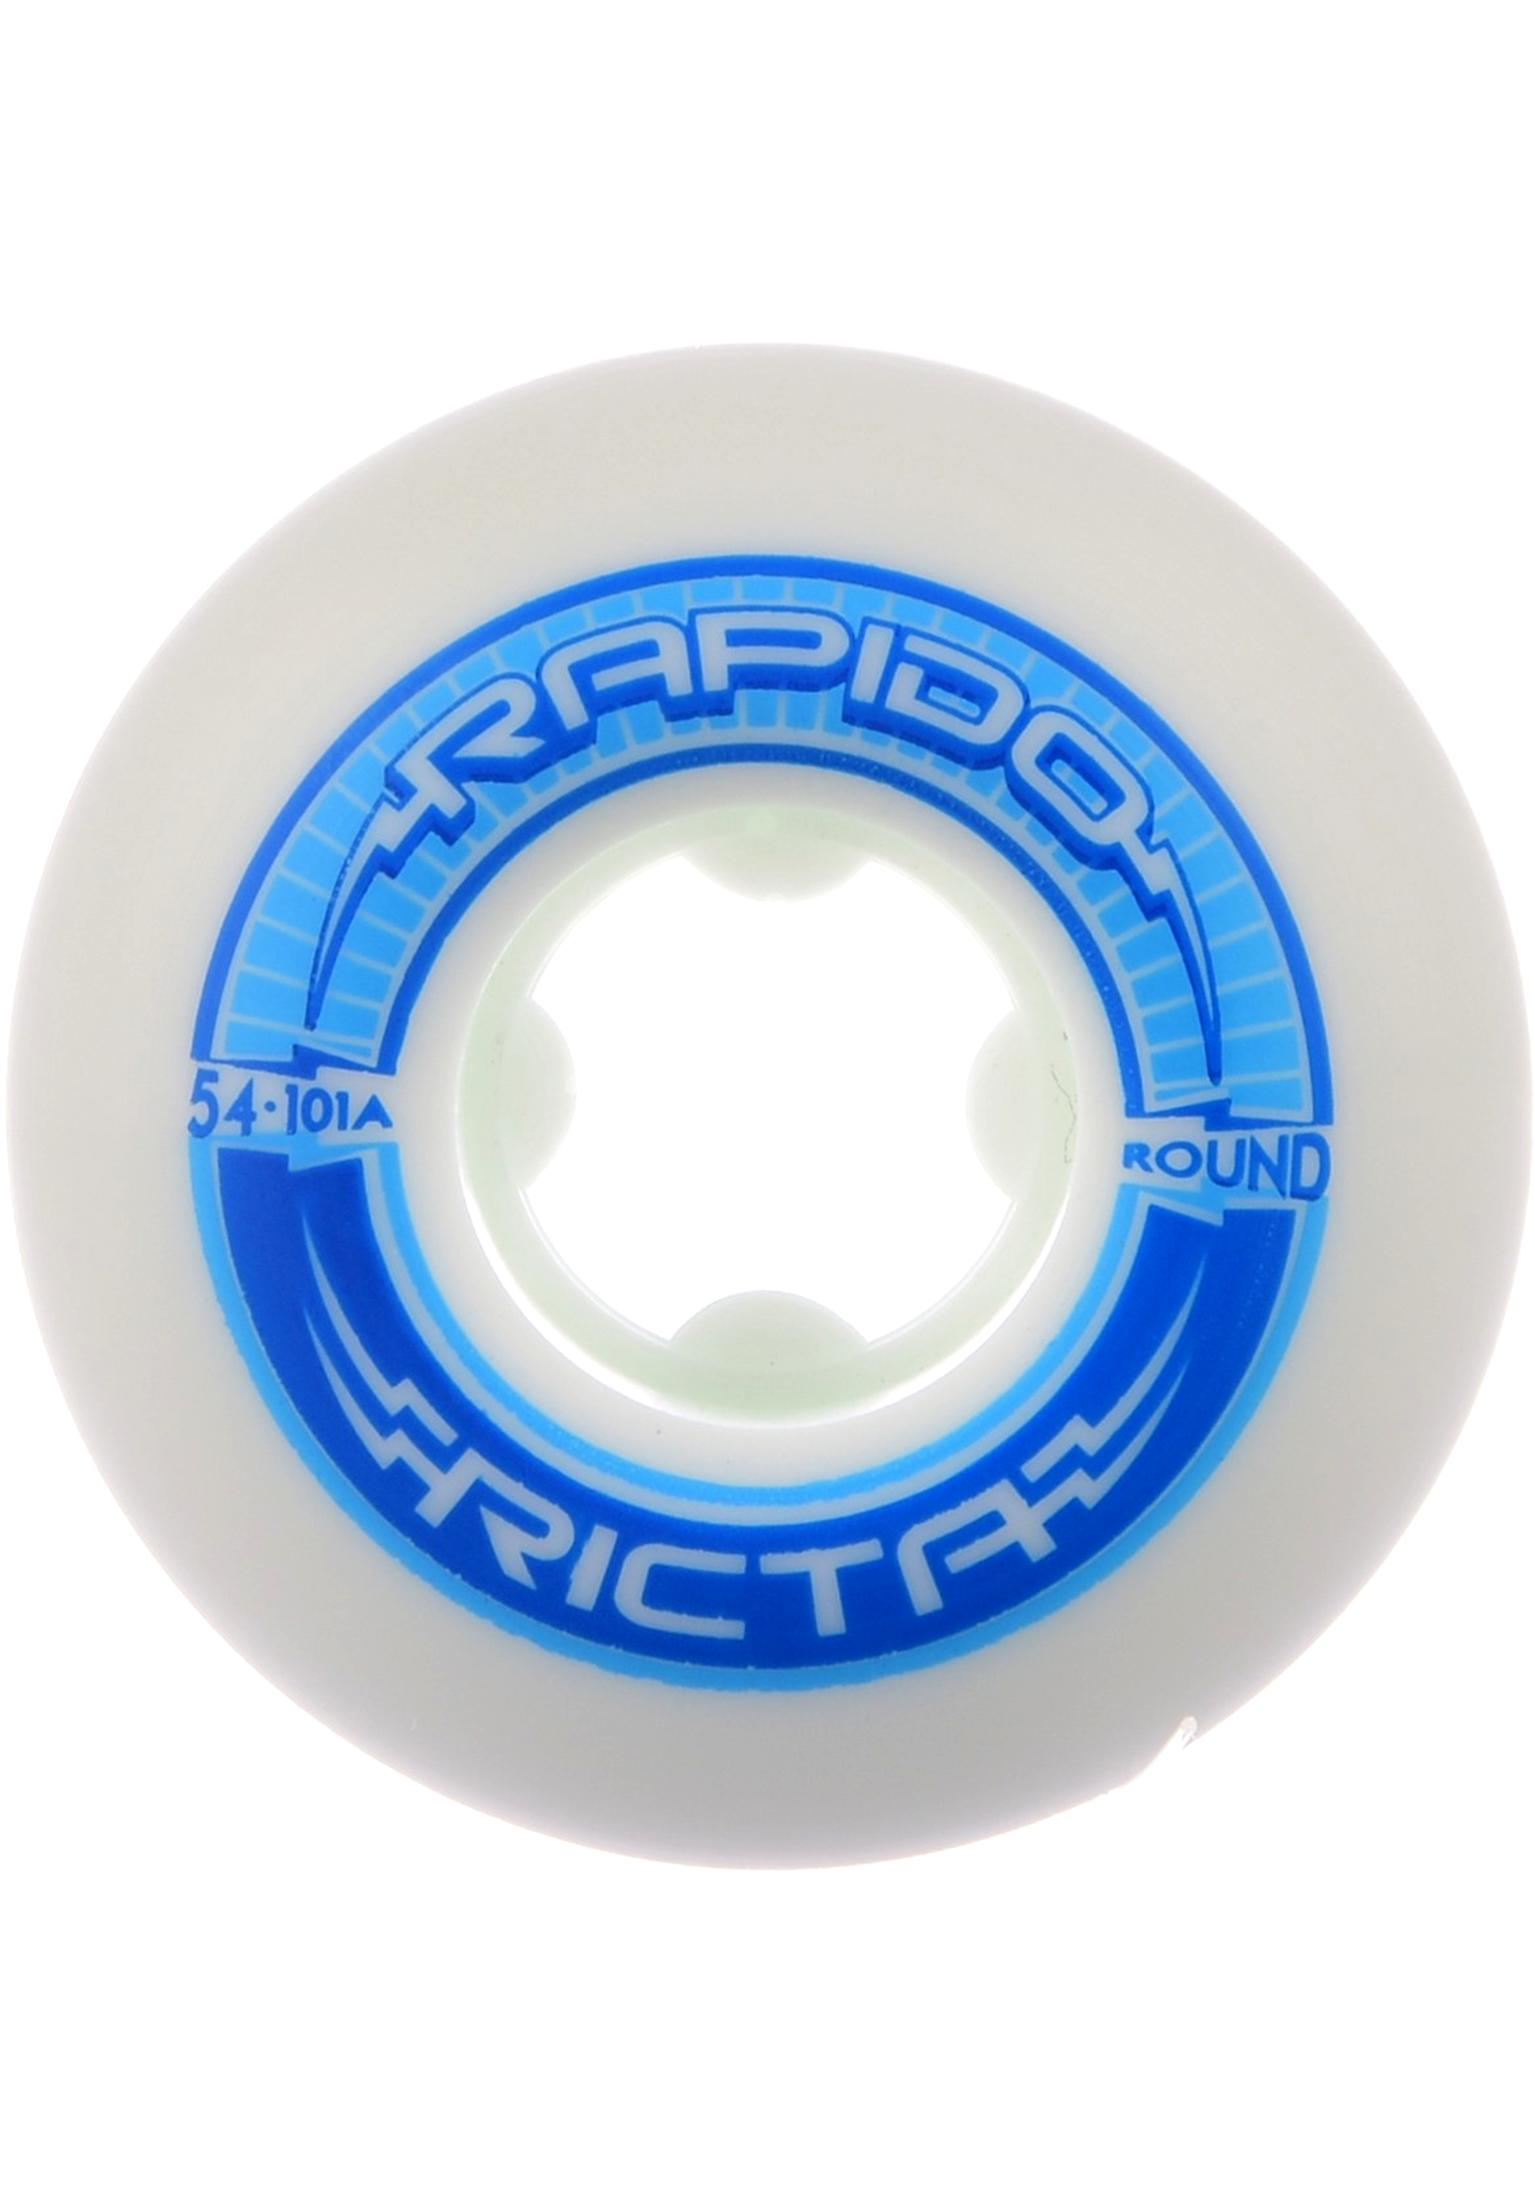 Ricta White Rapido Round 101A 56mm Skateboard Wheels